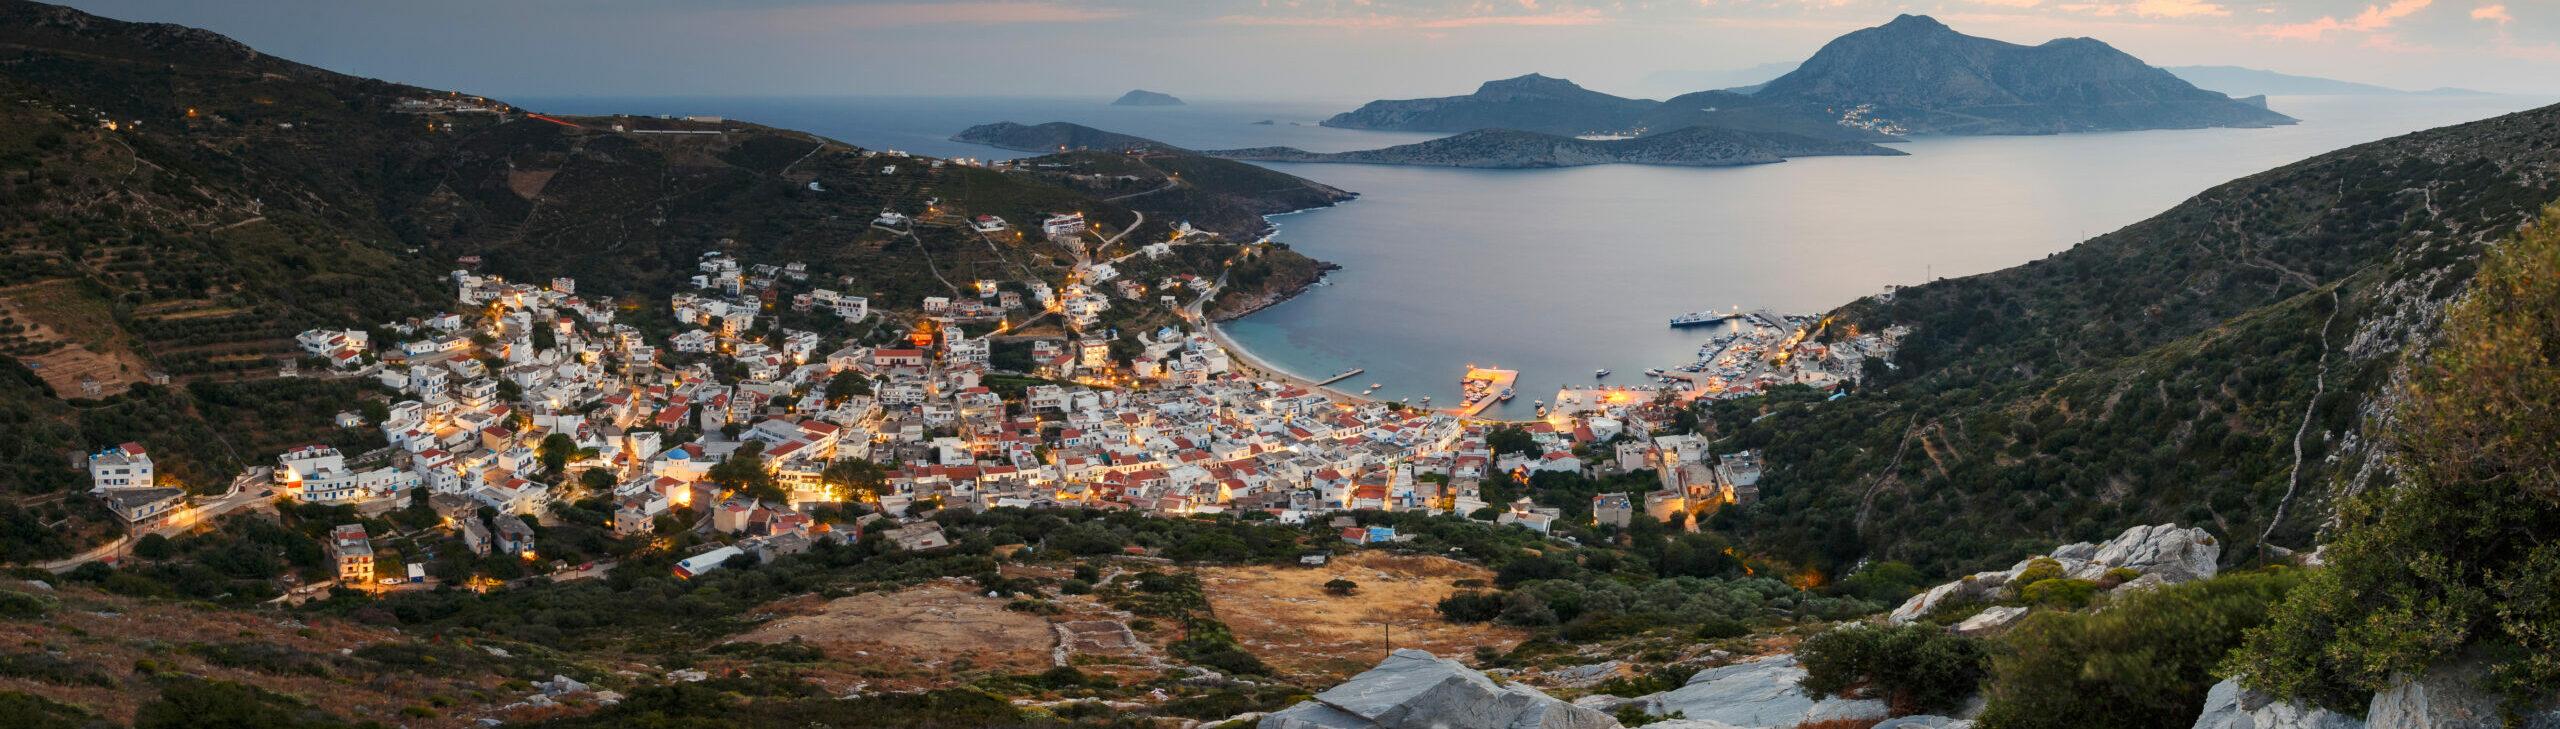 Fournoi: The quiet island of the eastern Aegean Sea